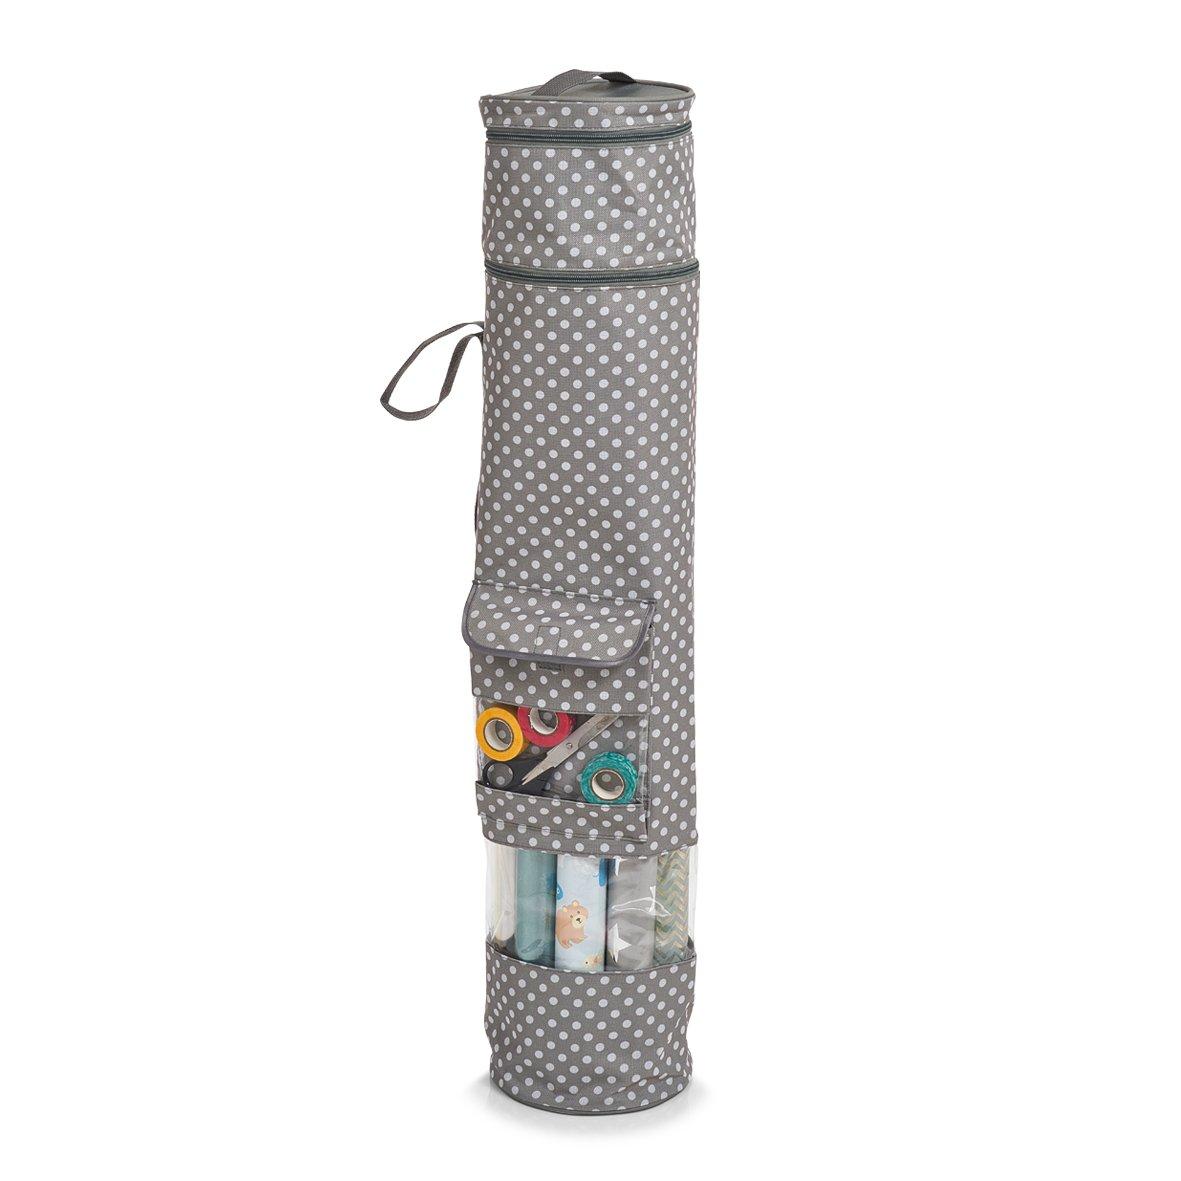 Polyester Gris Zeller 14660 Caja para Papel de Regalo 17x17x85 cm